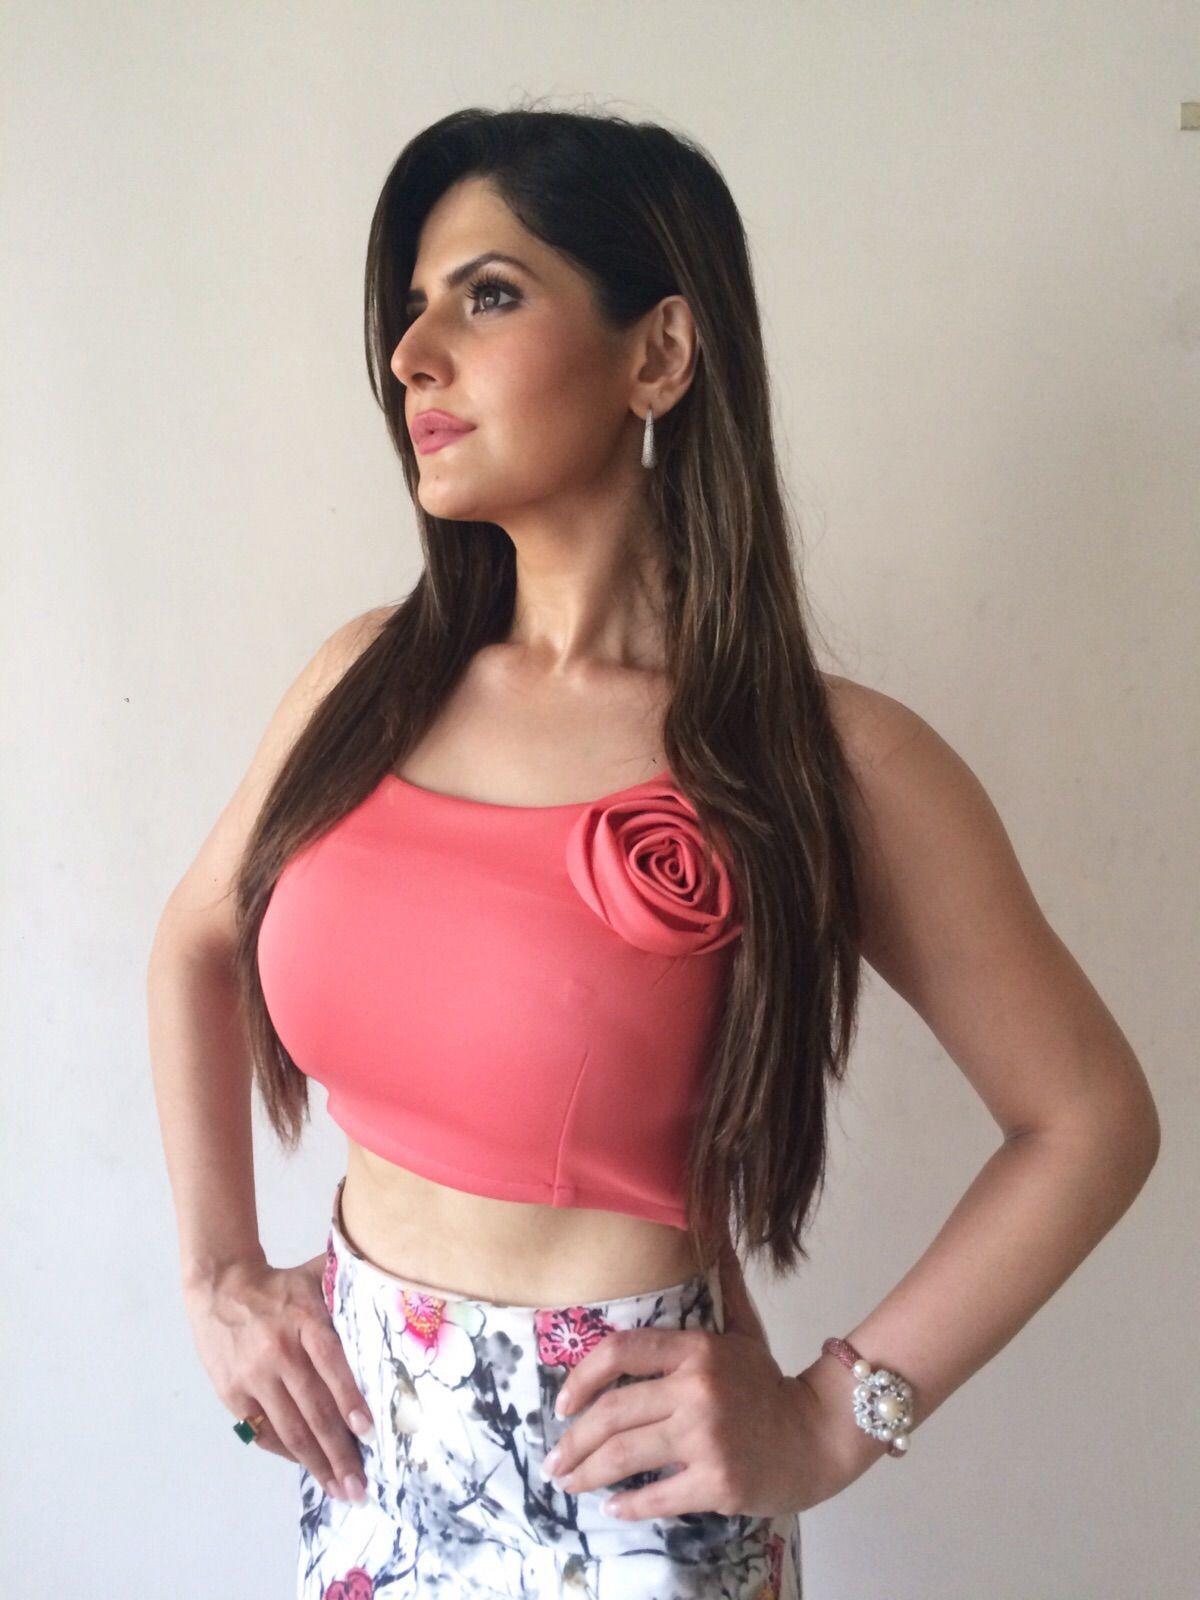 Hot Sexy Bollywood Actress Top  Most Beautiful Indian Women Of  Hd Photos